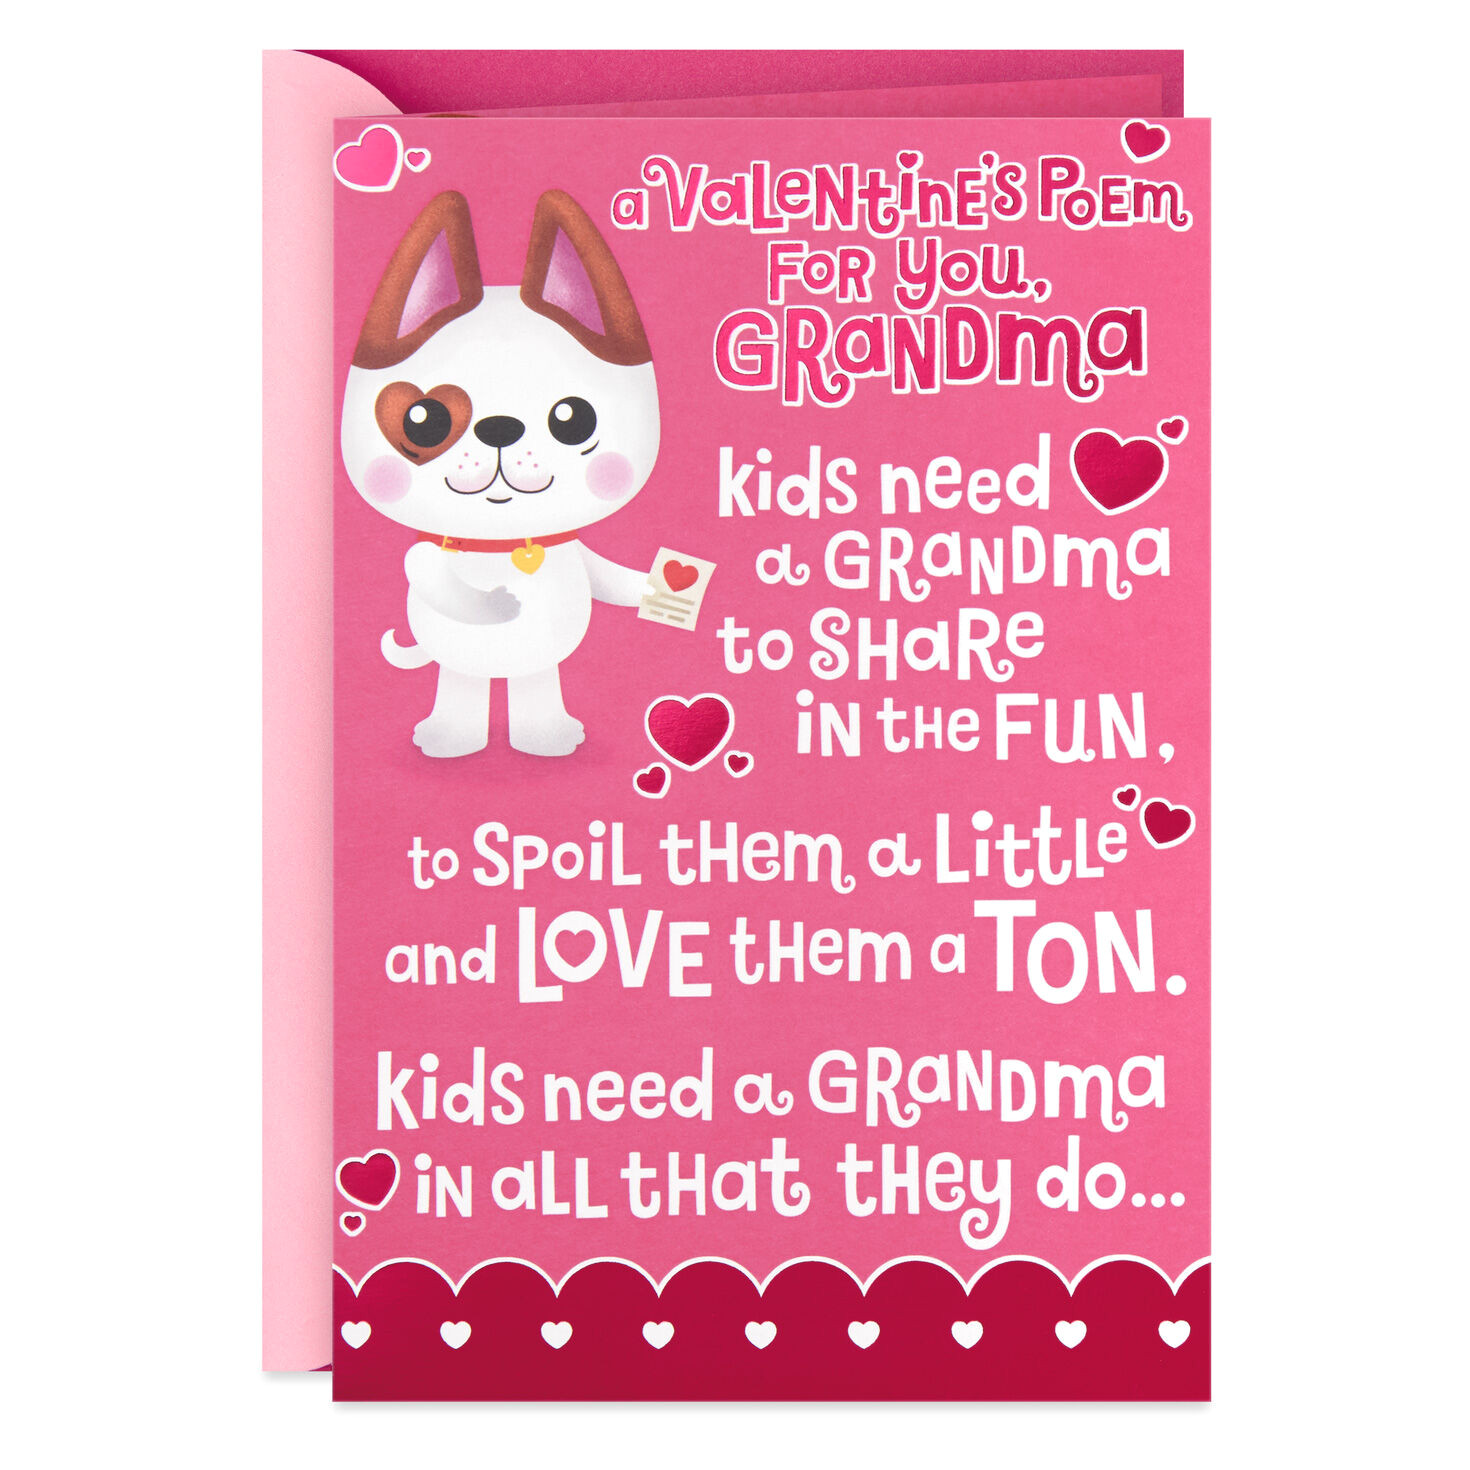 cute dog popup valentines day card for grandma 499vkd9947 01 jpg